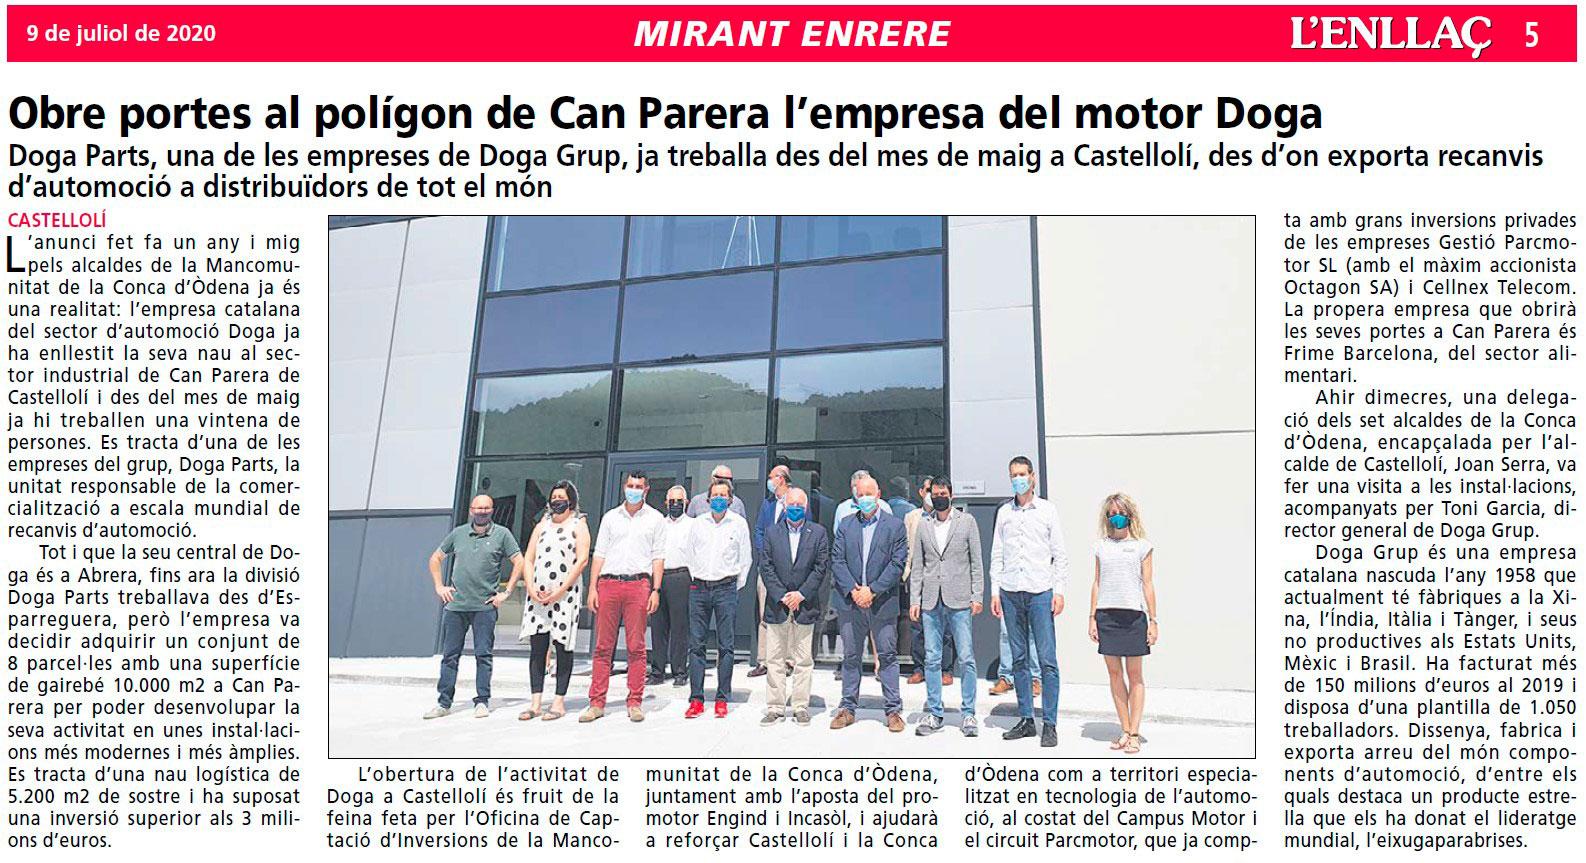 noticia_ignaguracion_castelloli_doga_enllac_interior